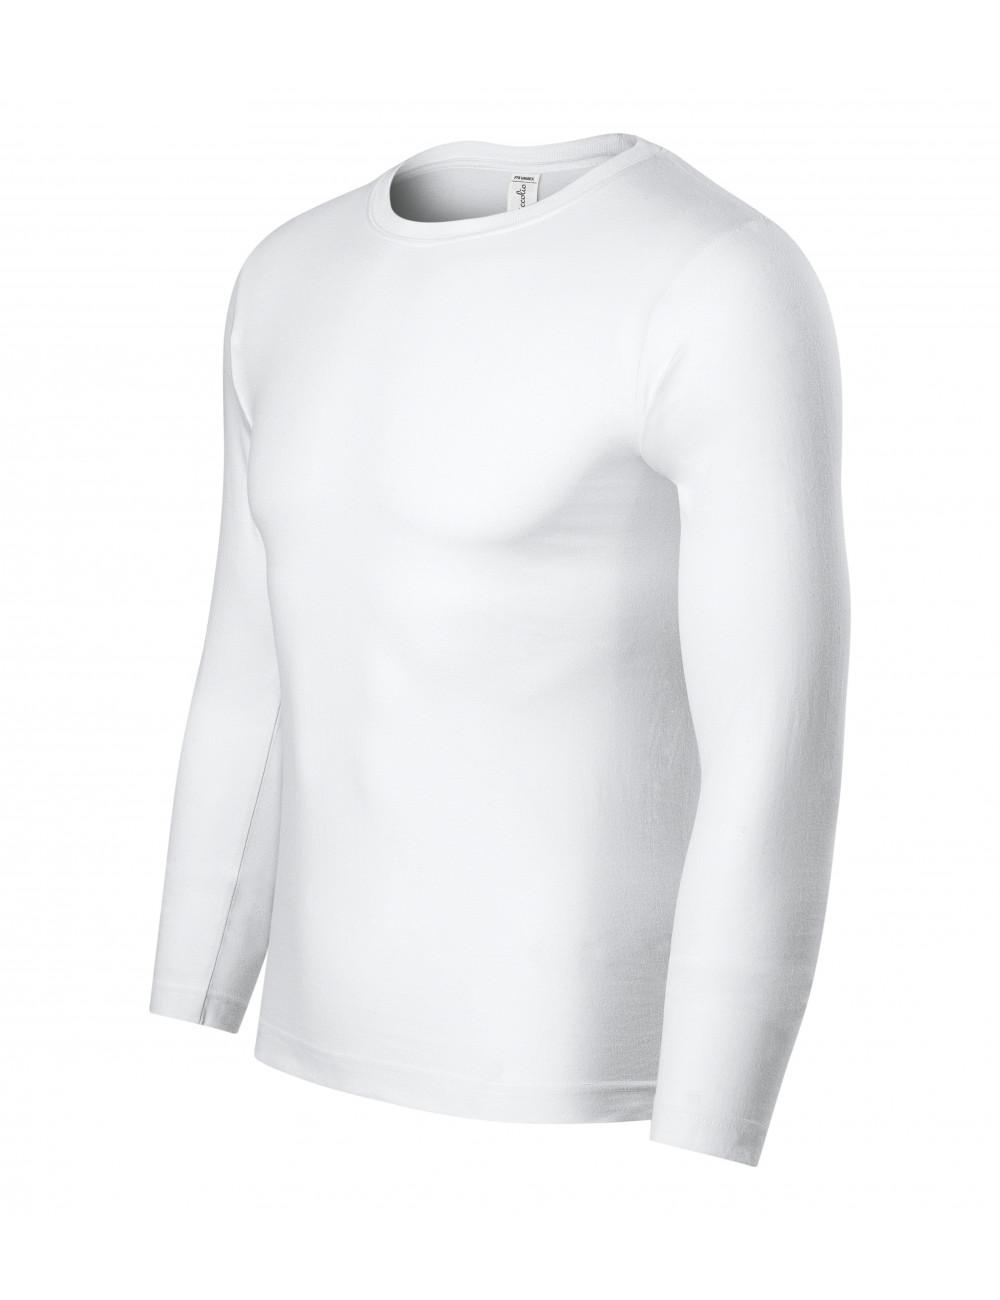 Adler PICCOLIO Koszulka unisex Progress LS P75 biały